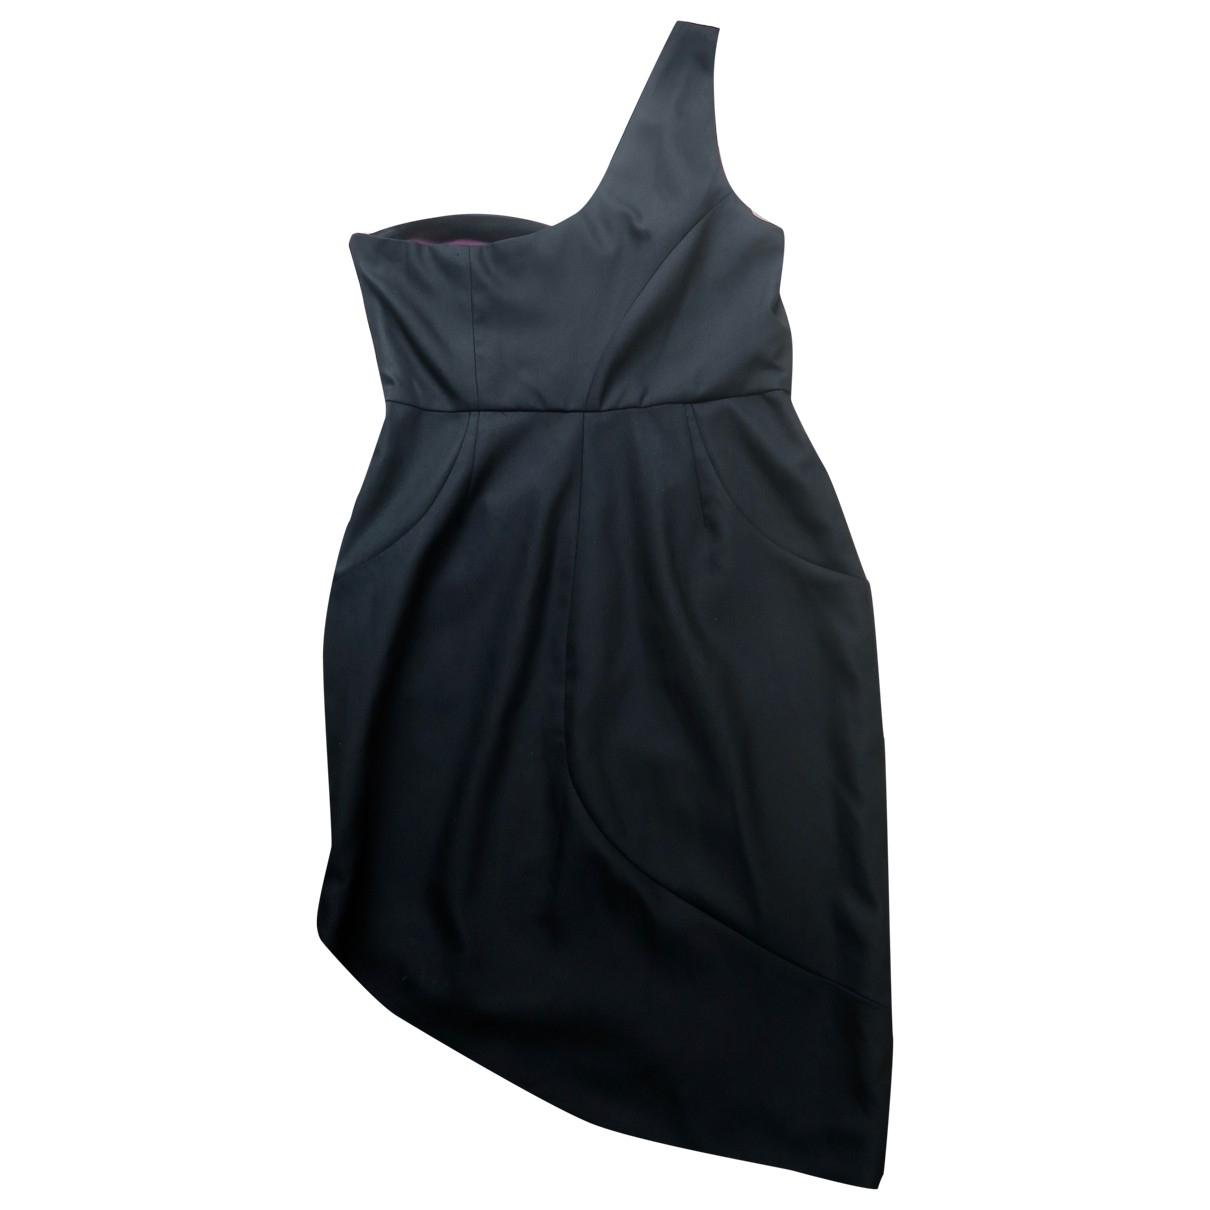 Alice & Olivia \N Black Wool dress for Women 8 US